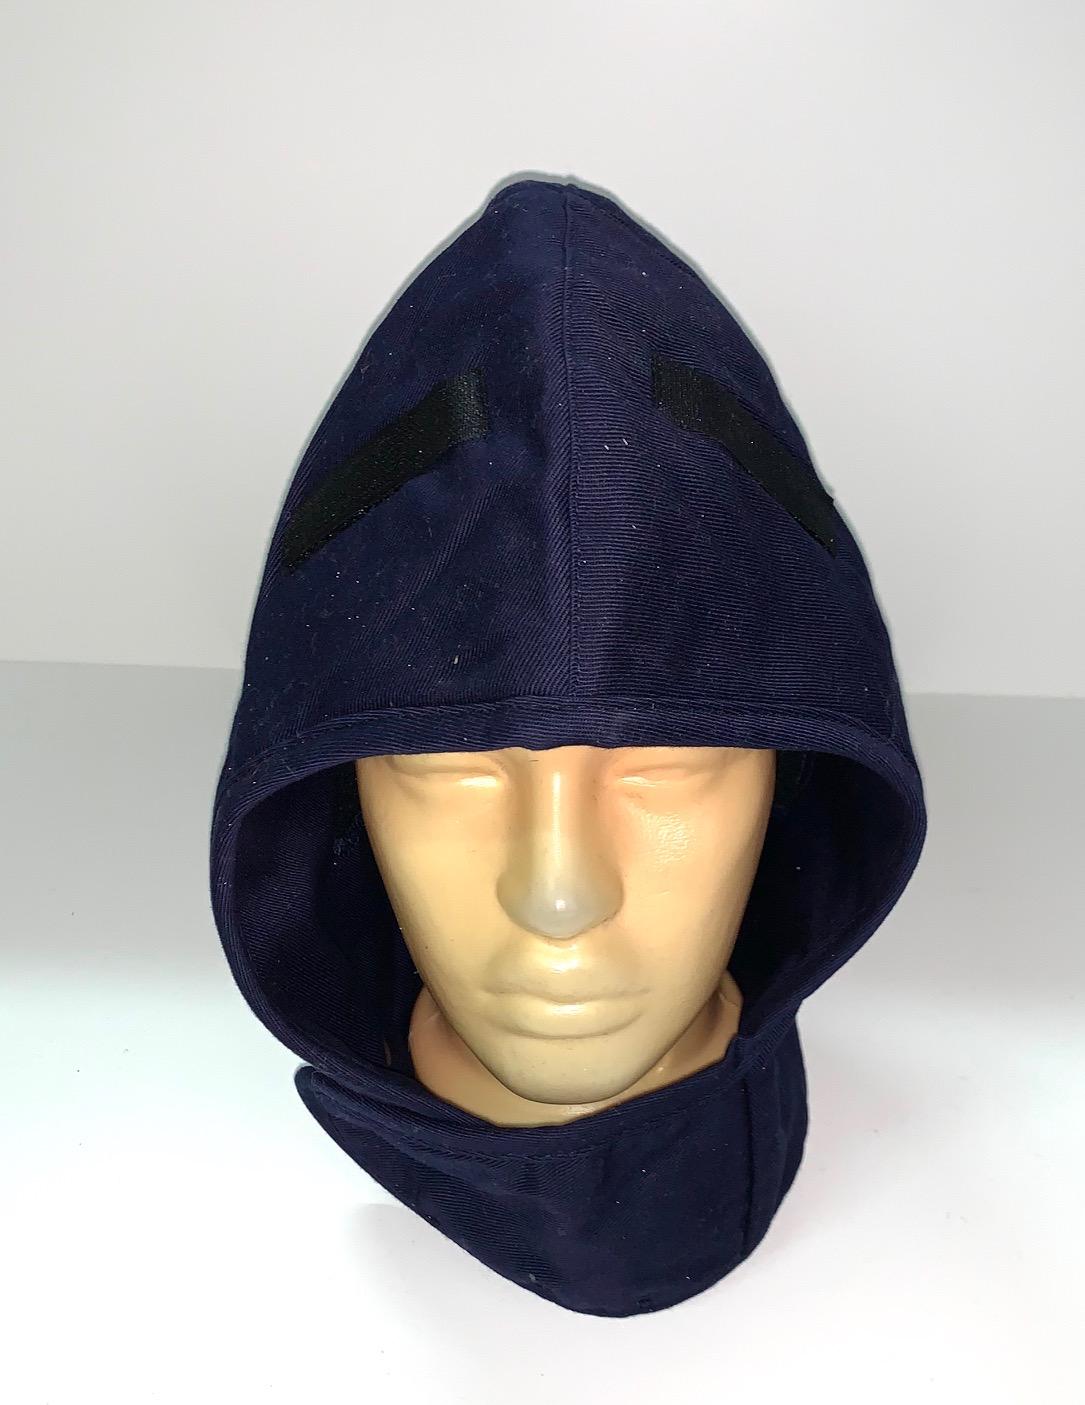 Темно-синий капор-капюшон